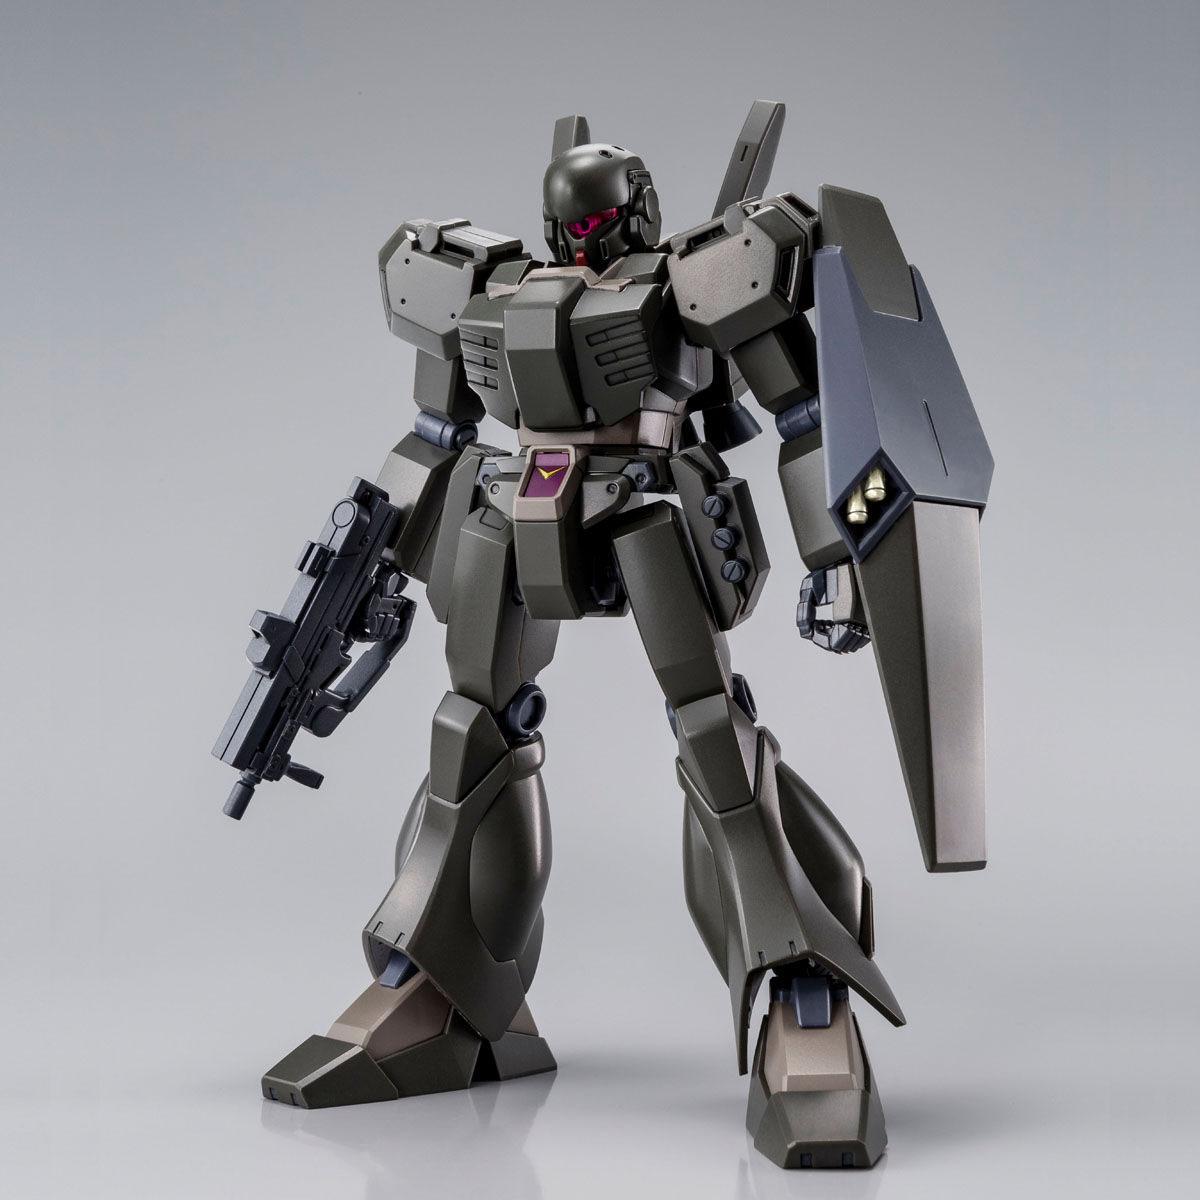 HG 1/144『ジェガンD型 (護衛隊仕様)』機動戦士ガンダムNT プラモデル-002